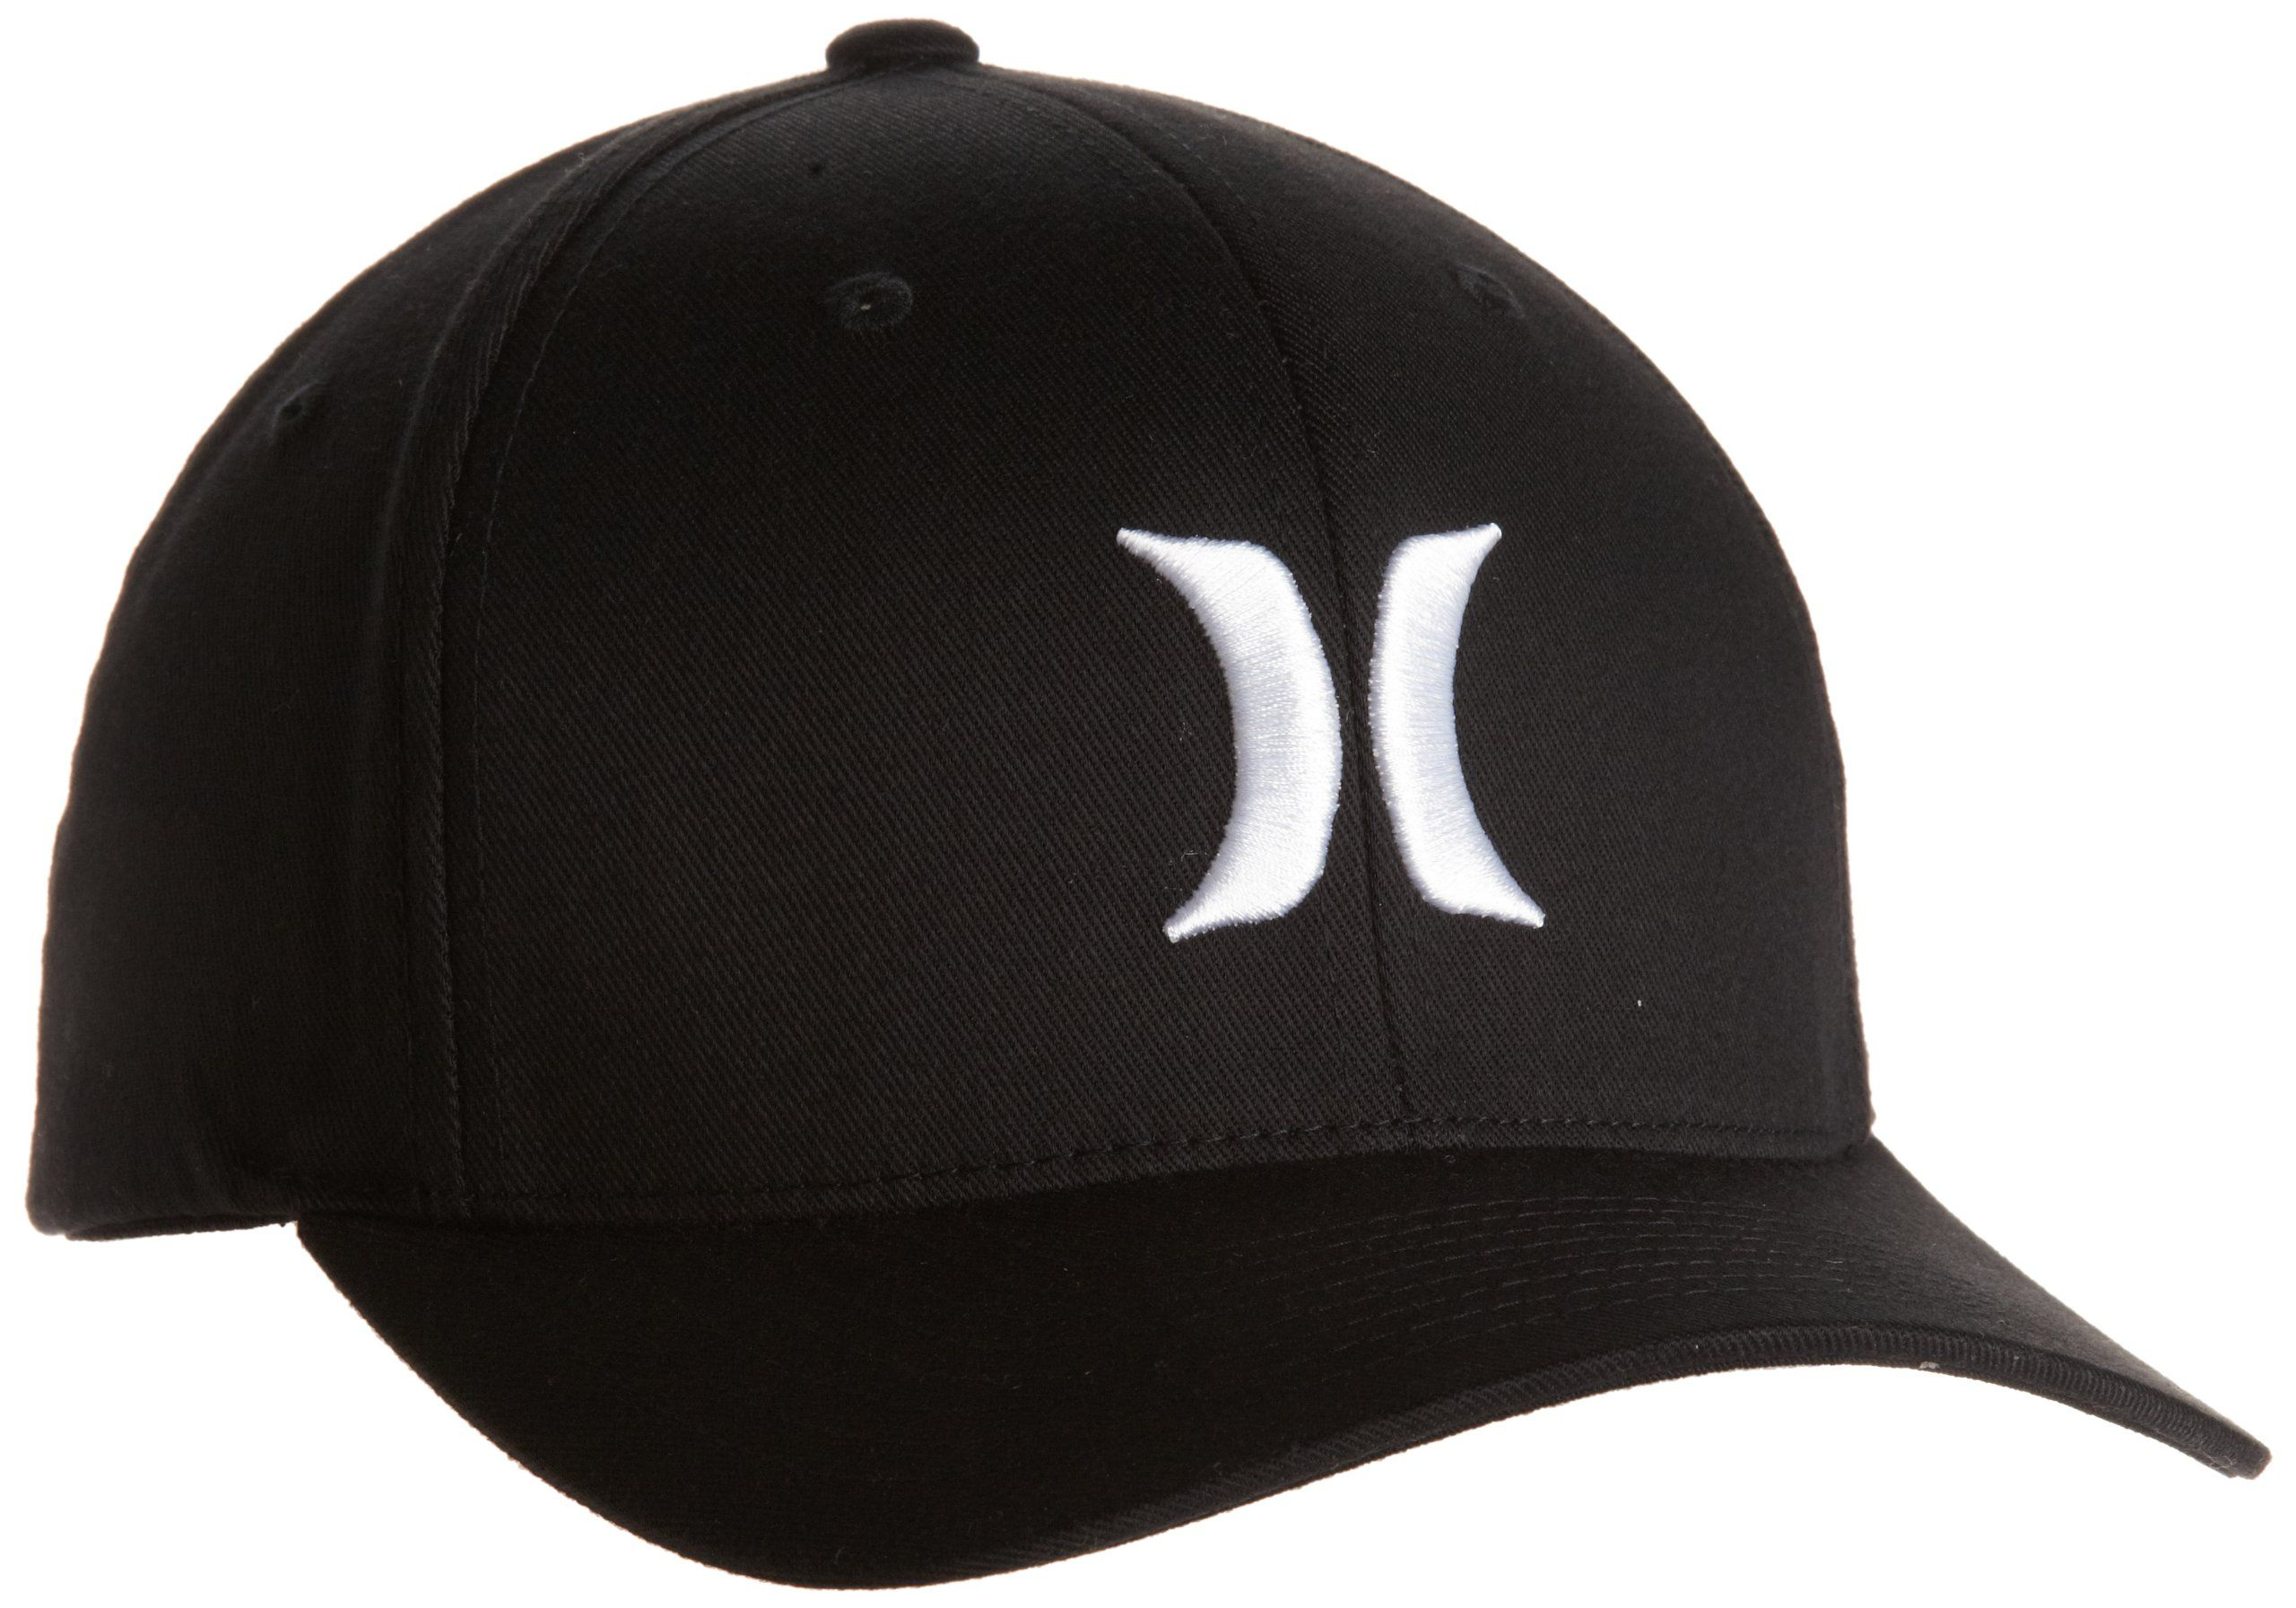 Hurley Cap One   Only Black Flexfit - Gorra de náutica f89089ded9d